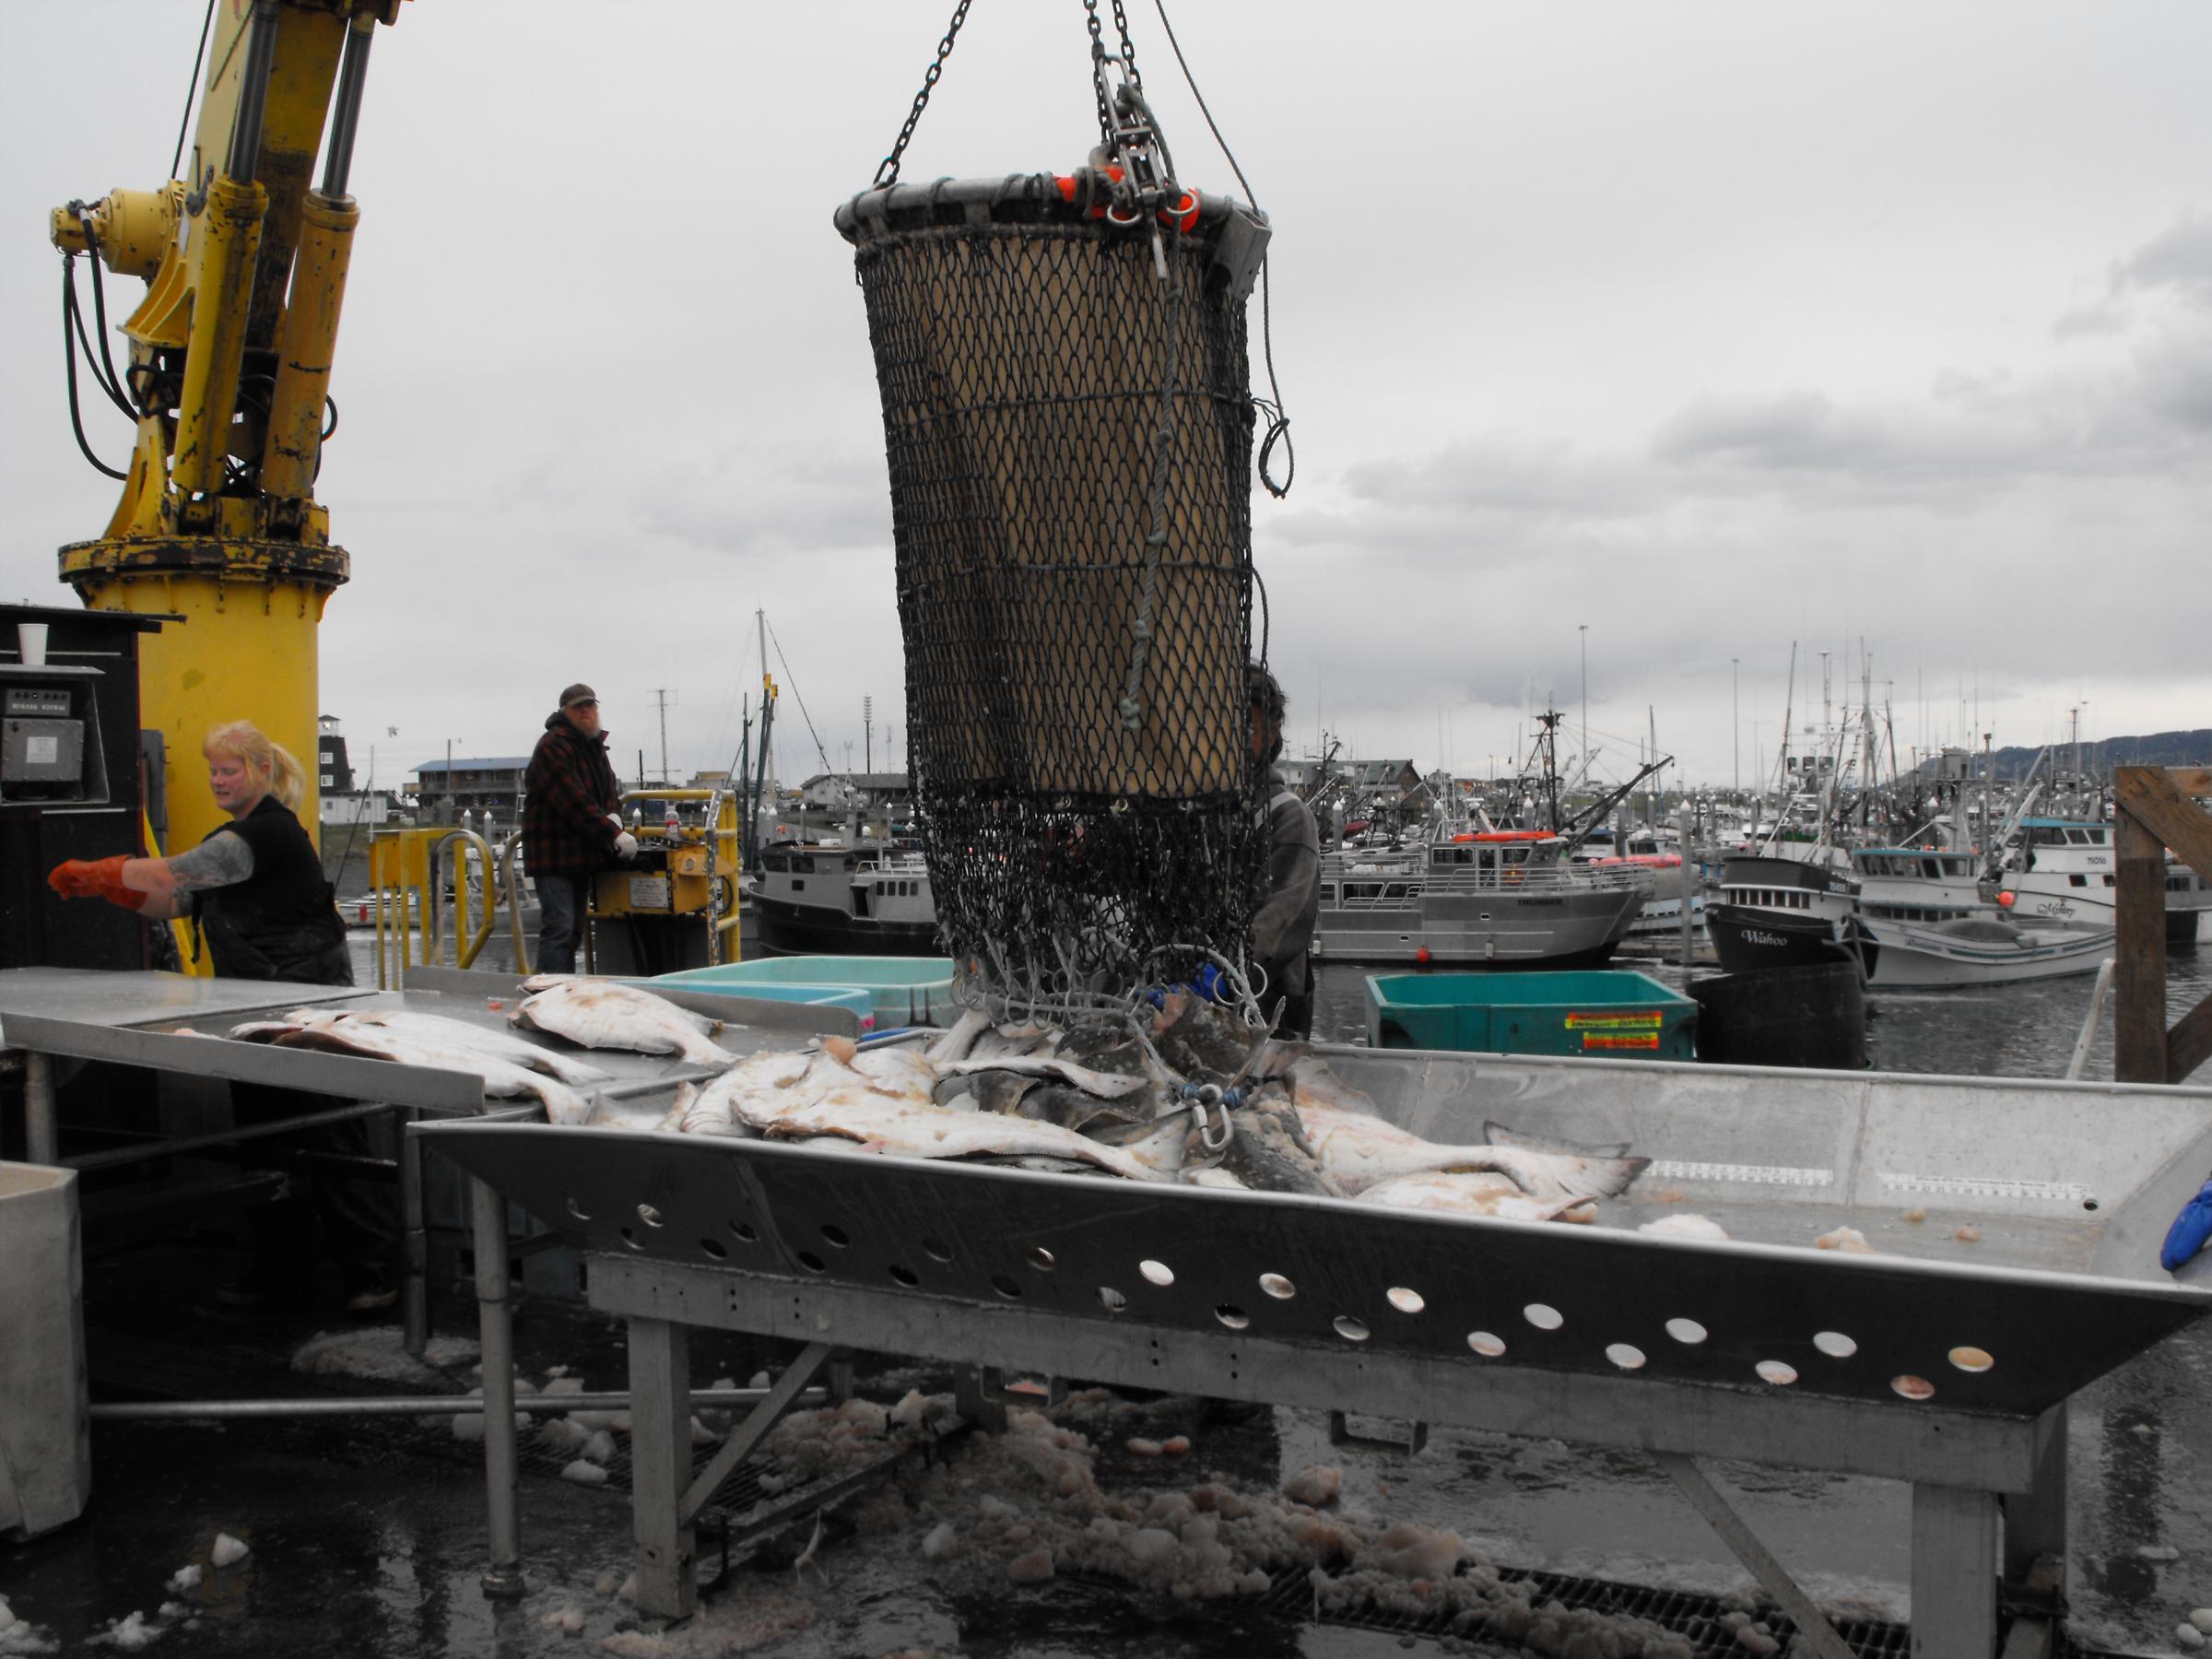 Fishermen offload halibut in Homer. (Photo courtesy Rudy Gustafson)